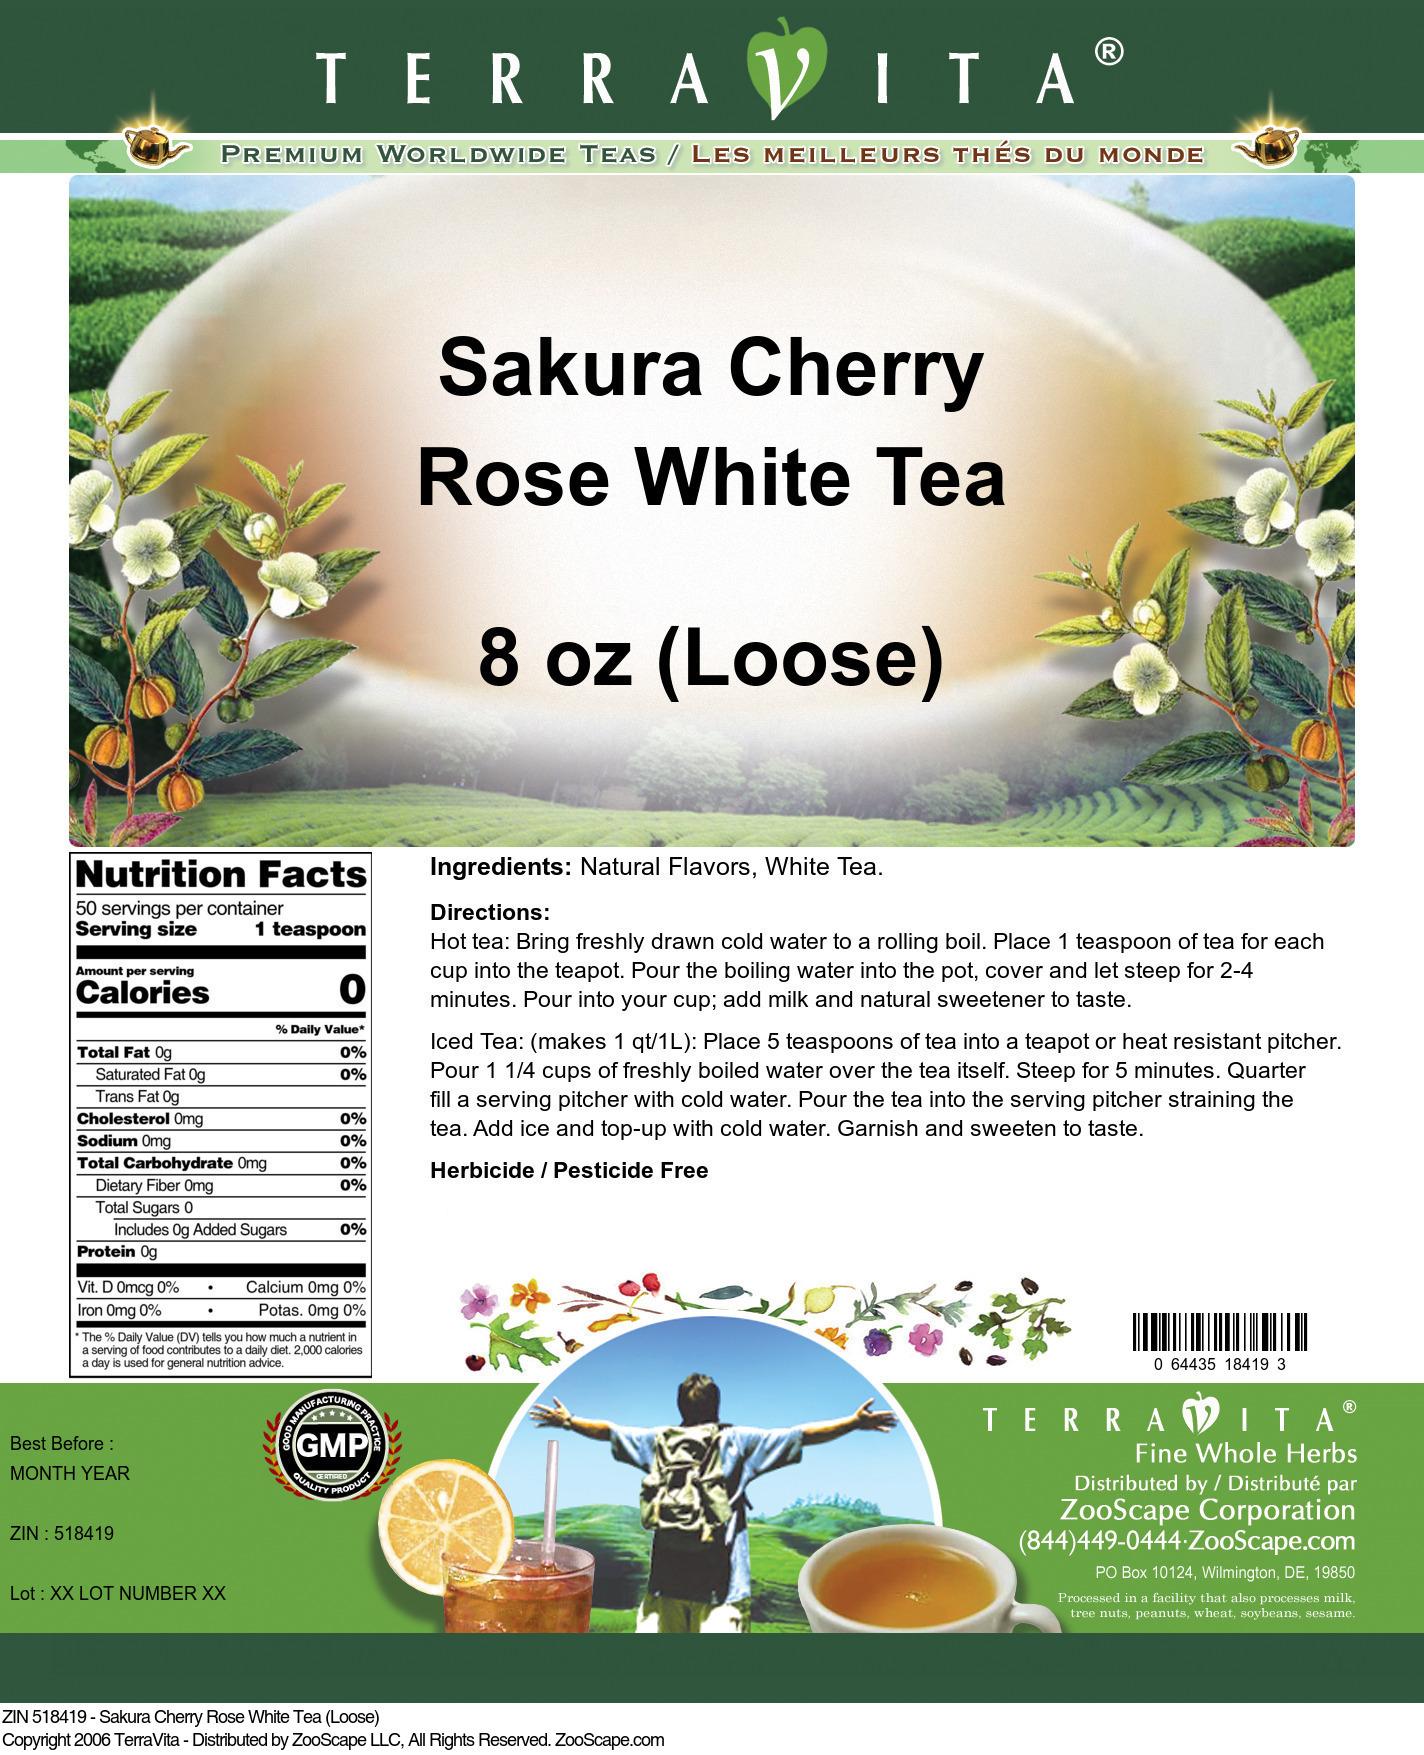 Sakura Cherry Rose White Tea (Loose)